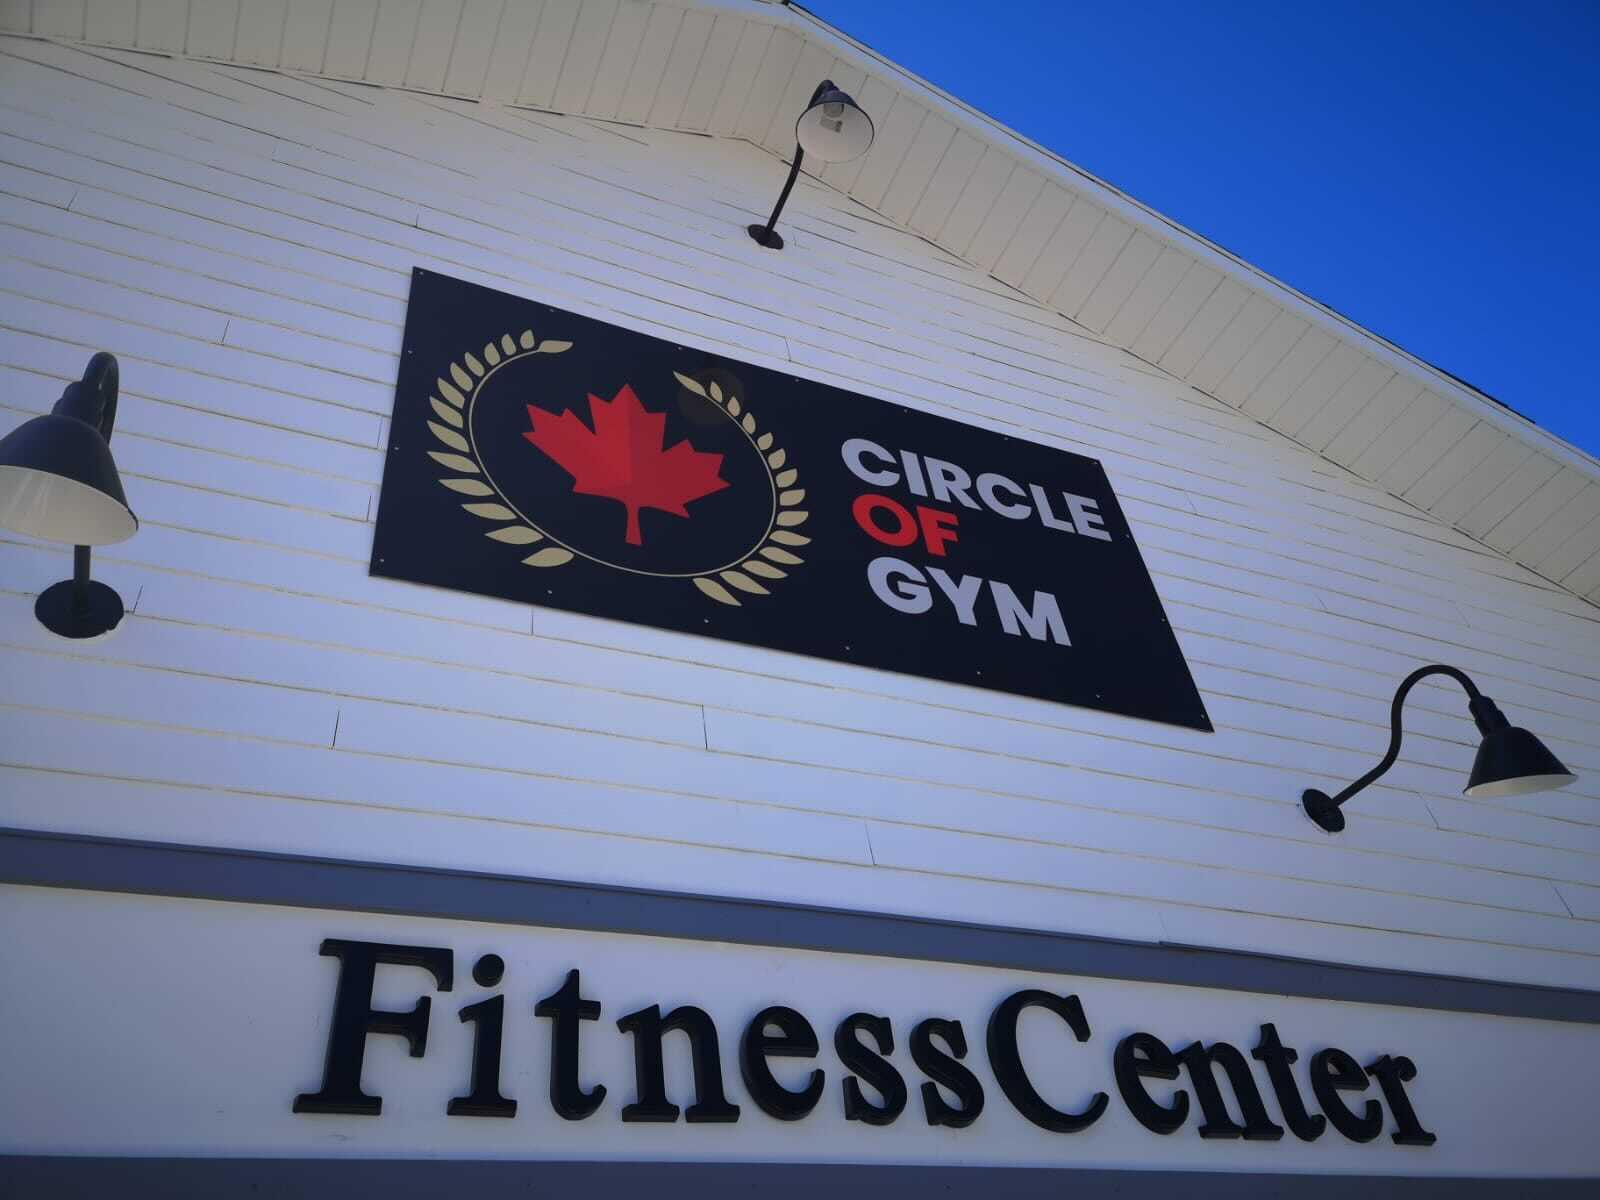 La palestra Circle of Gym